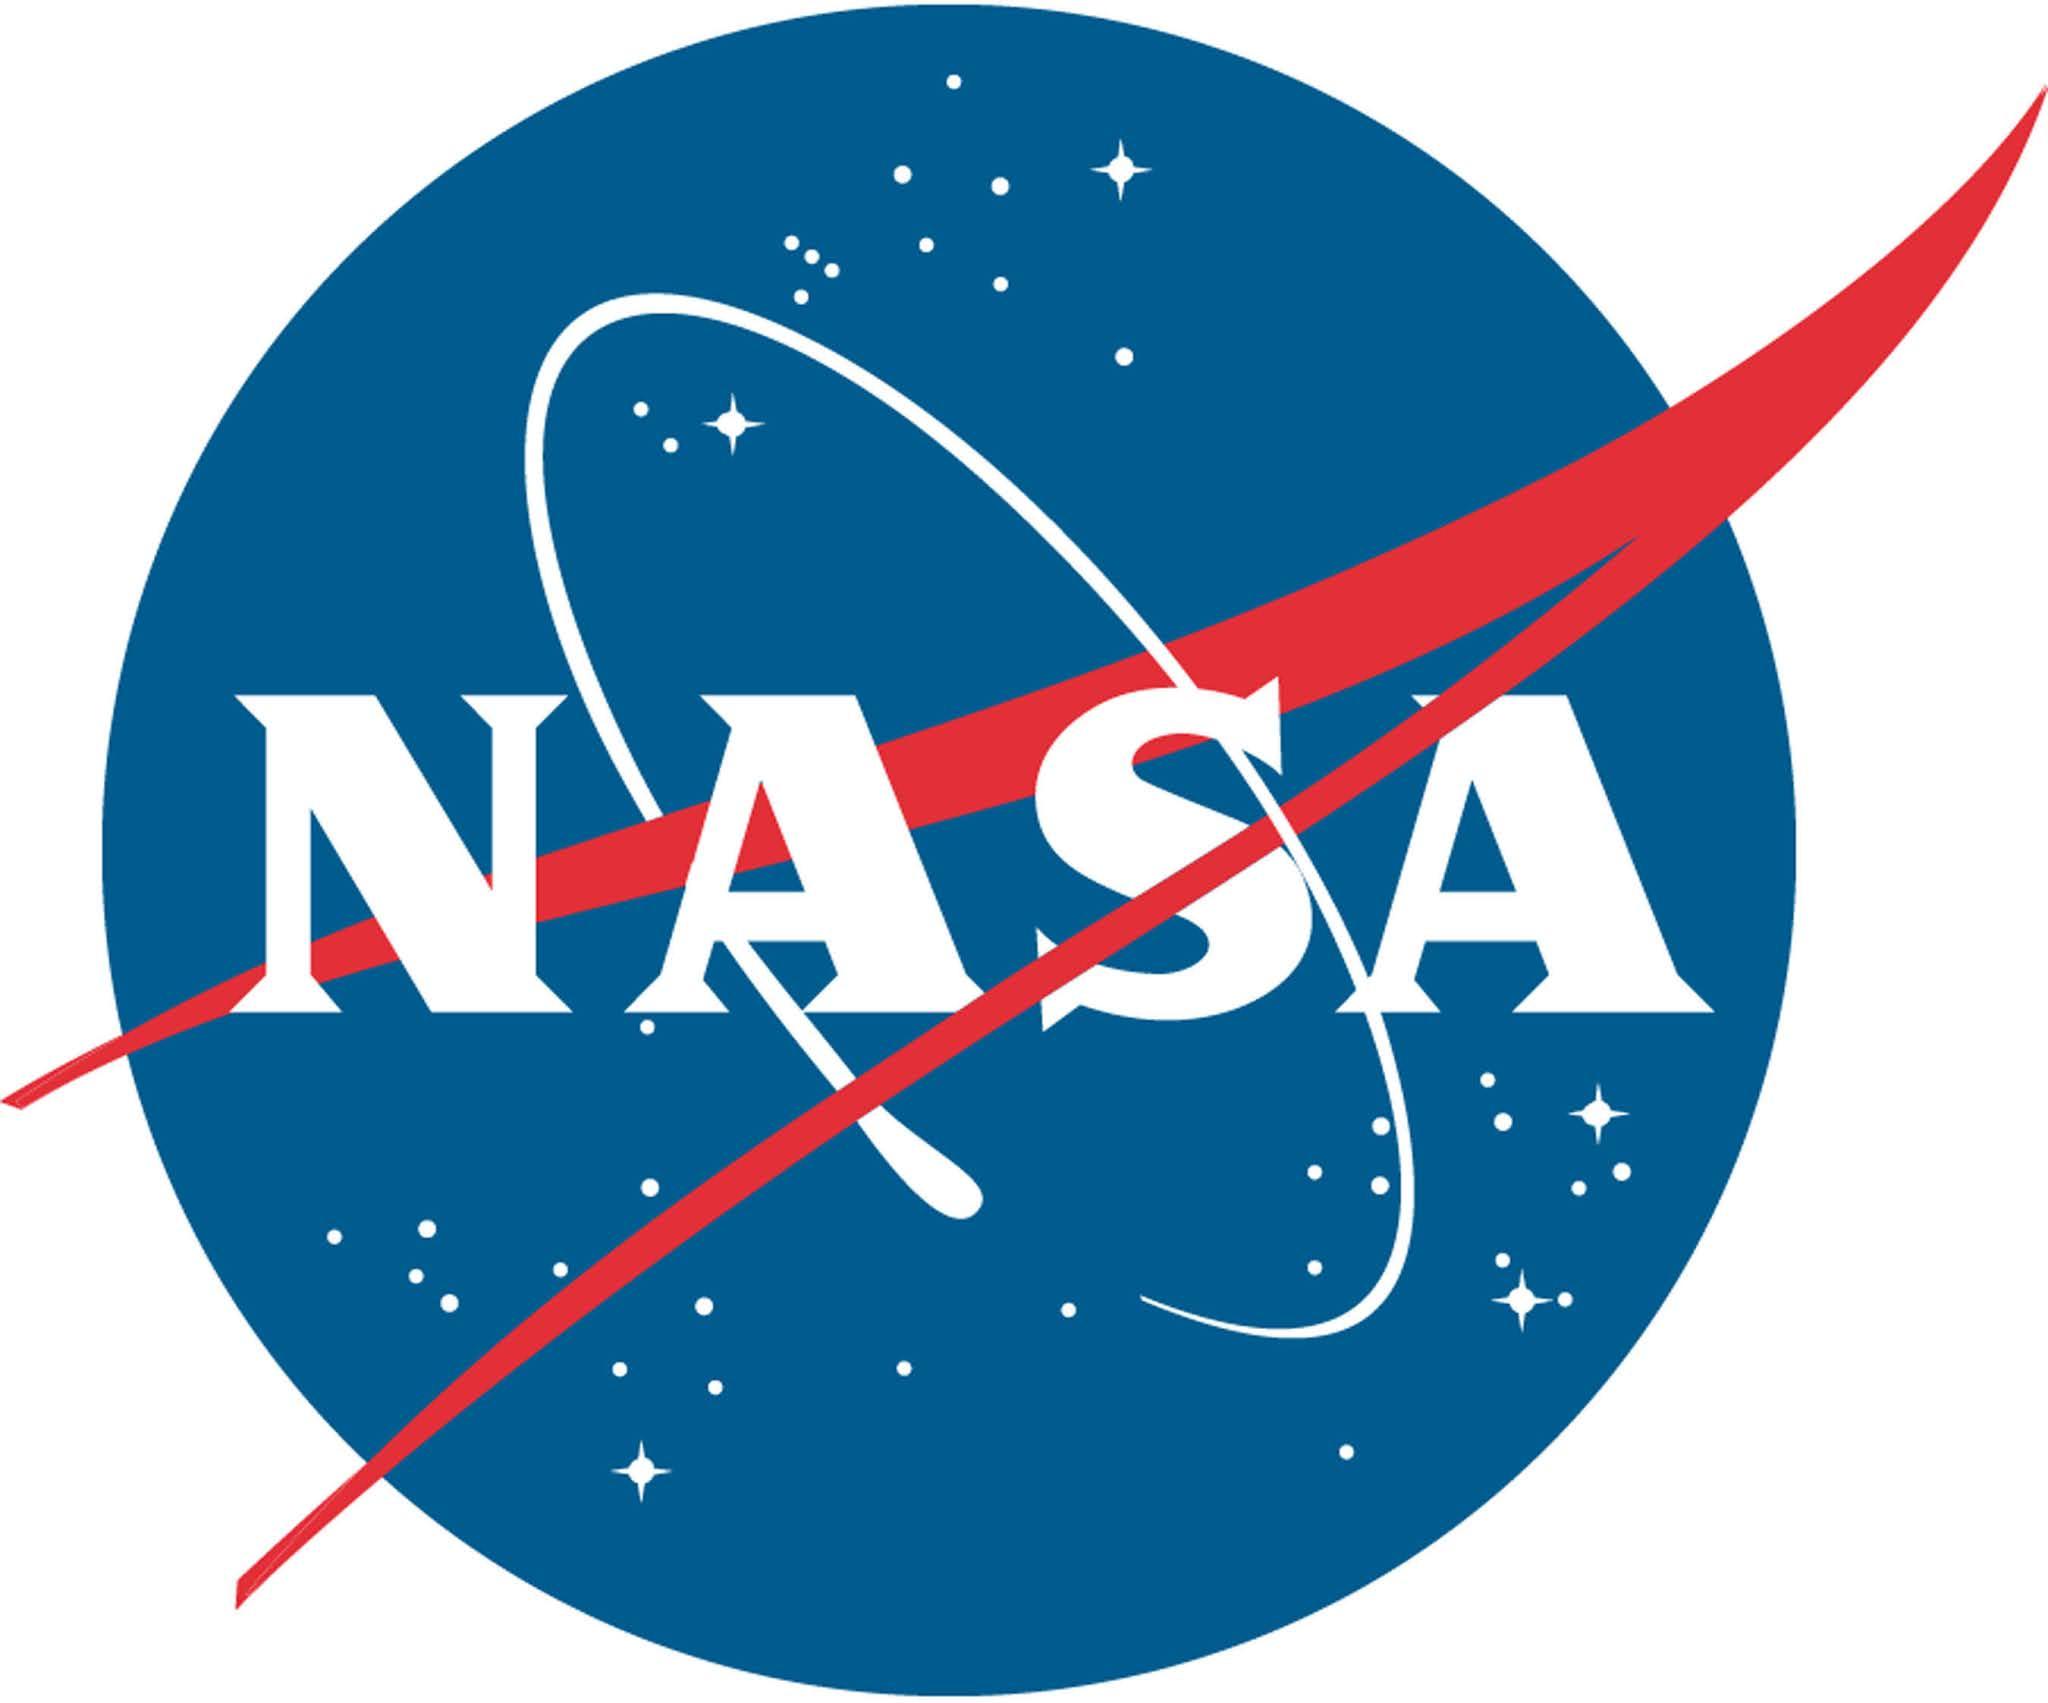 NASA to Broadcast OSIRIS-REx Asteroid Sample Collection Activities